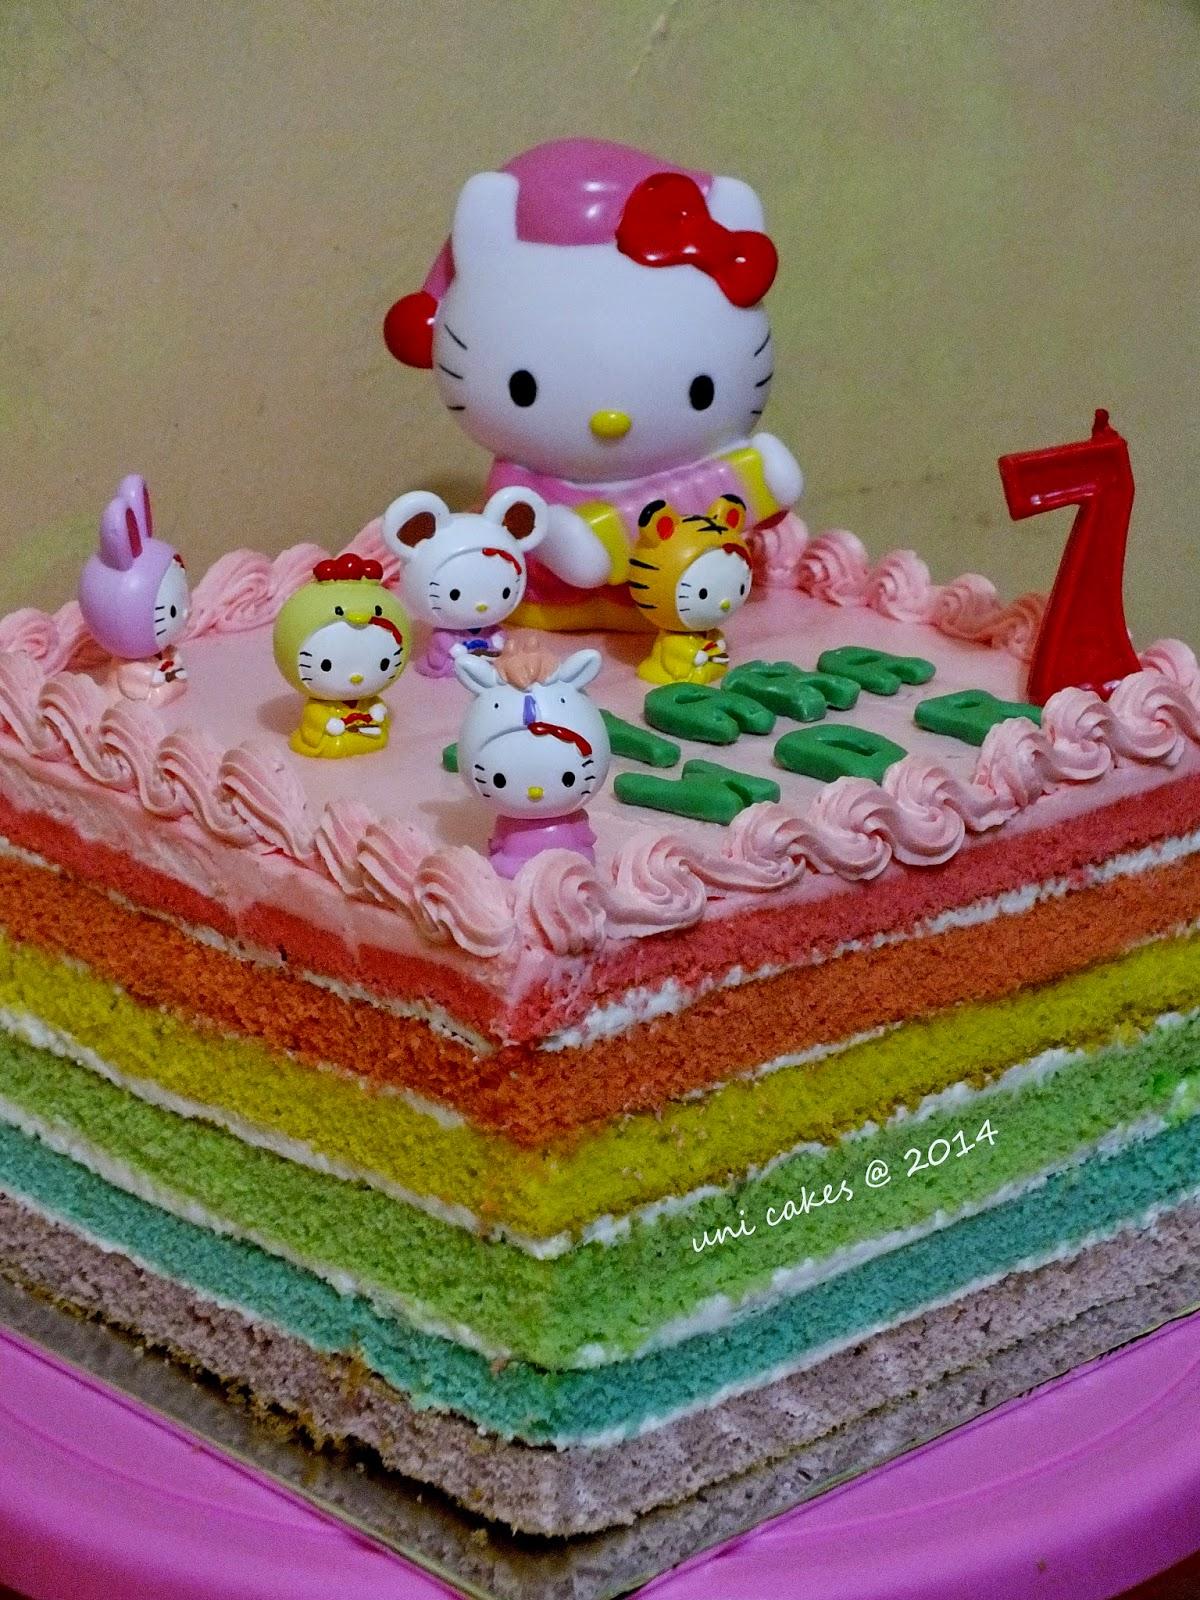 Dapur Cokelat Rainbow Cake Harga